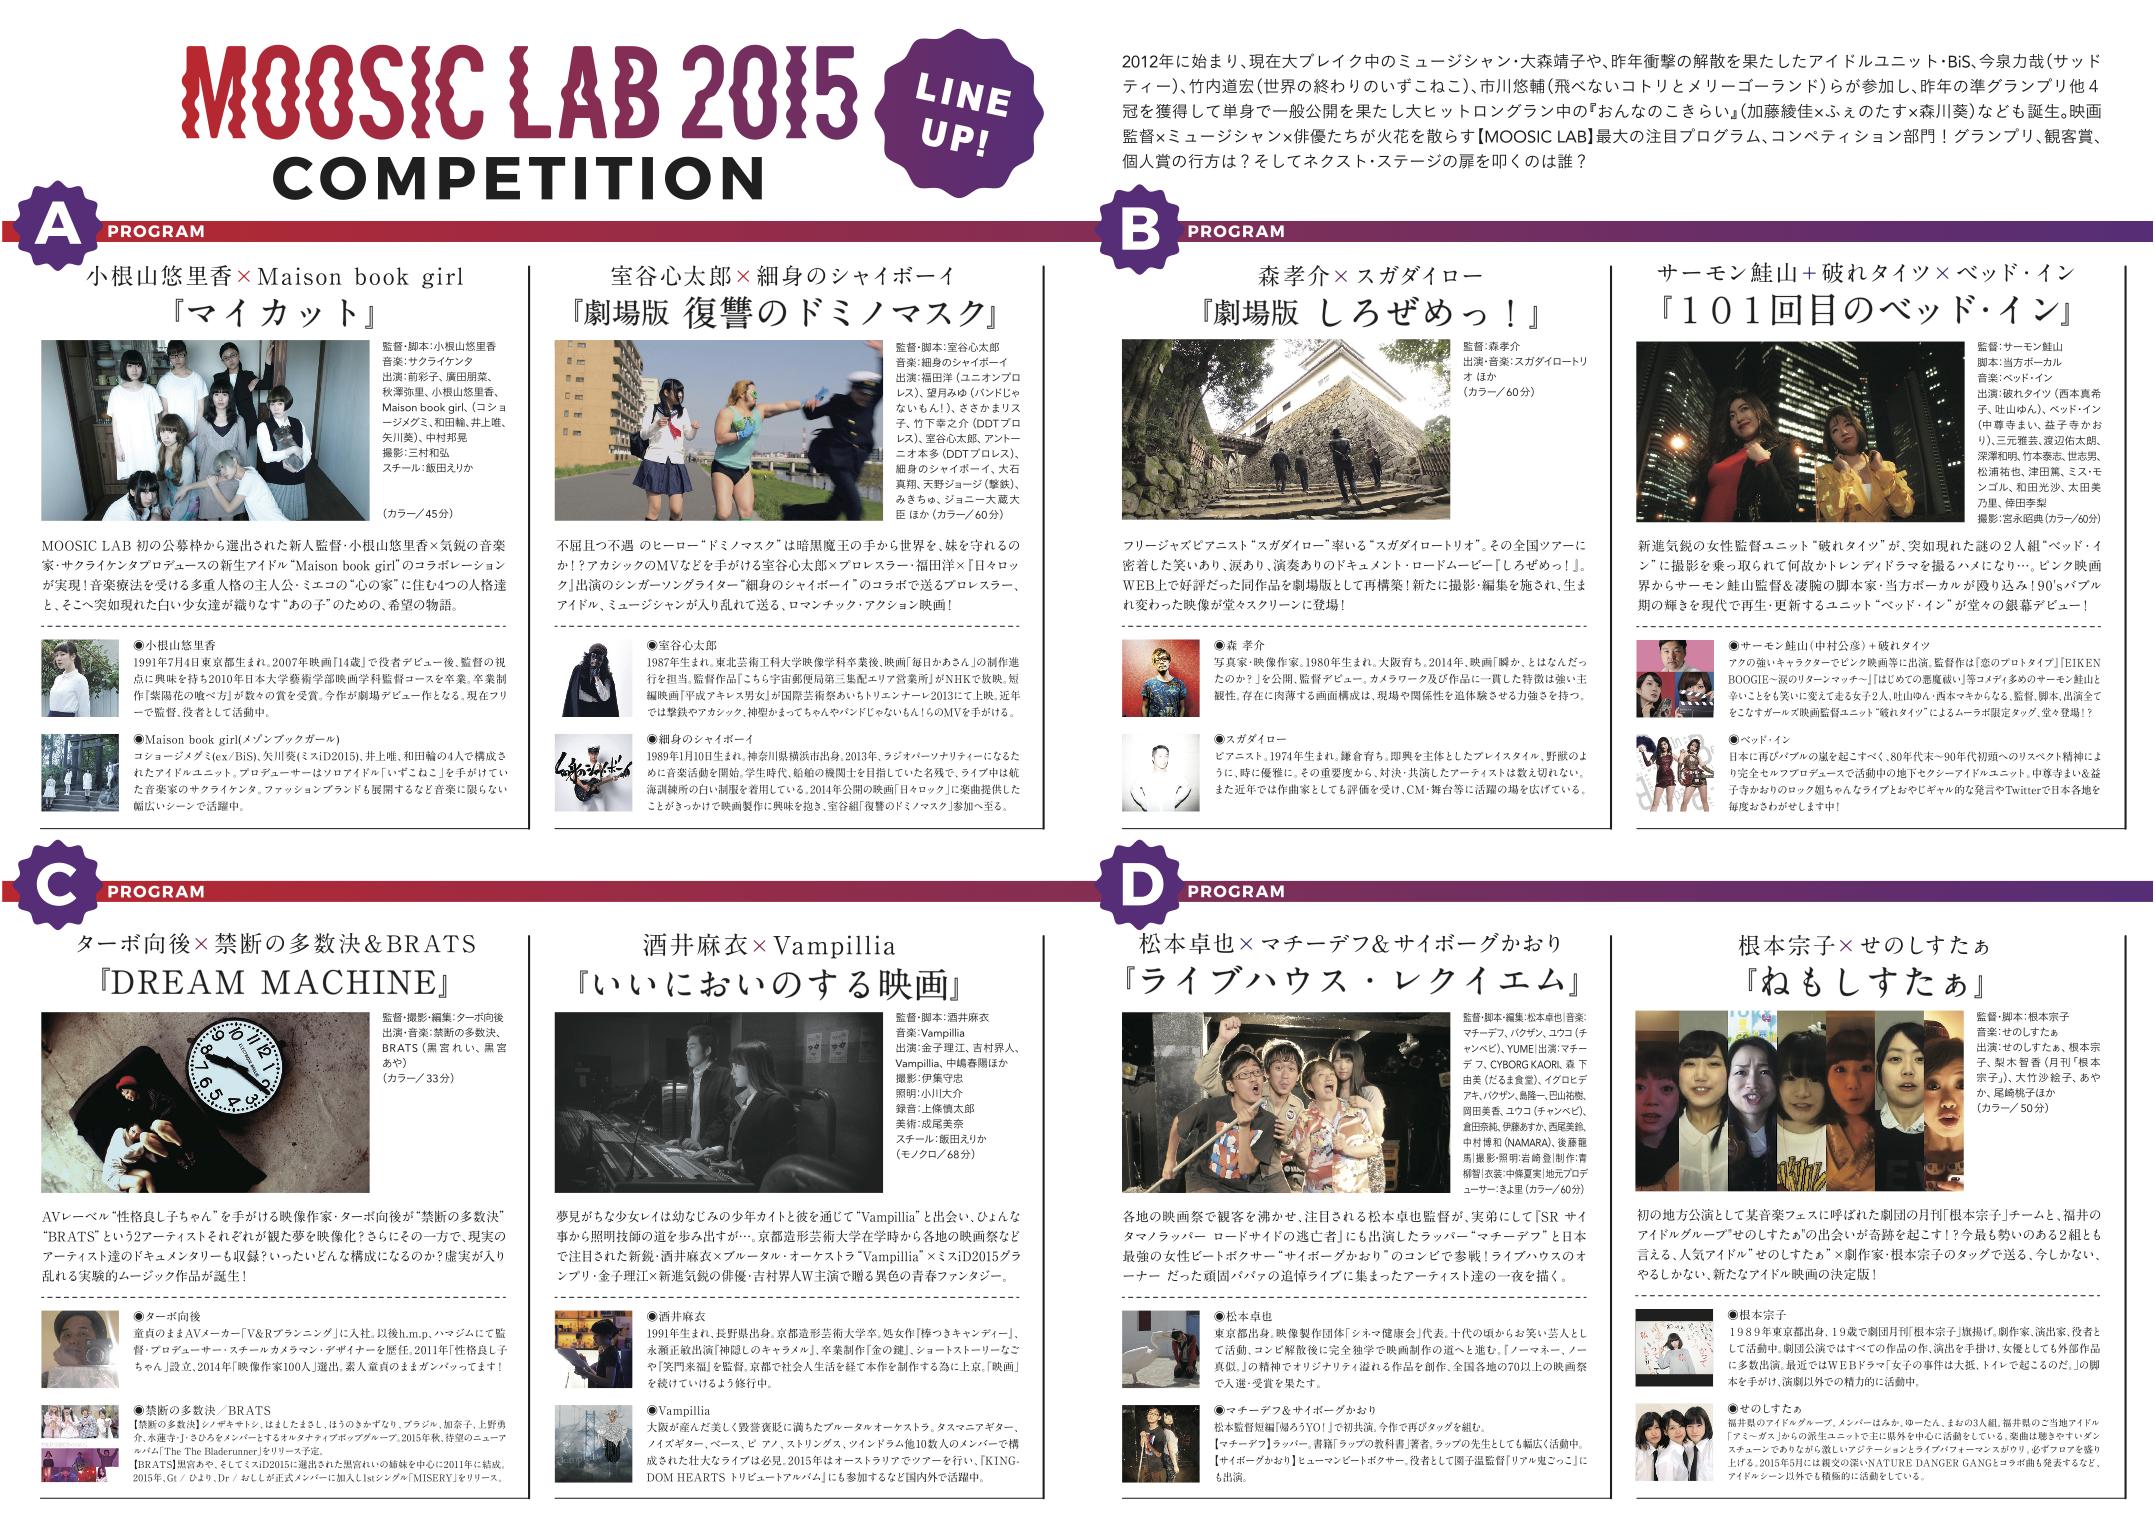 moosic2015compe_rissei_lineup